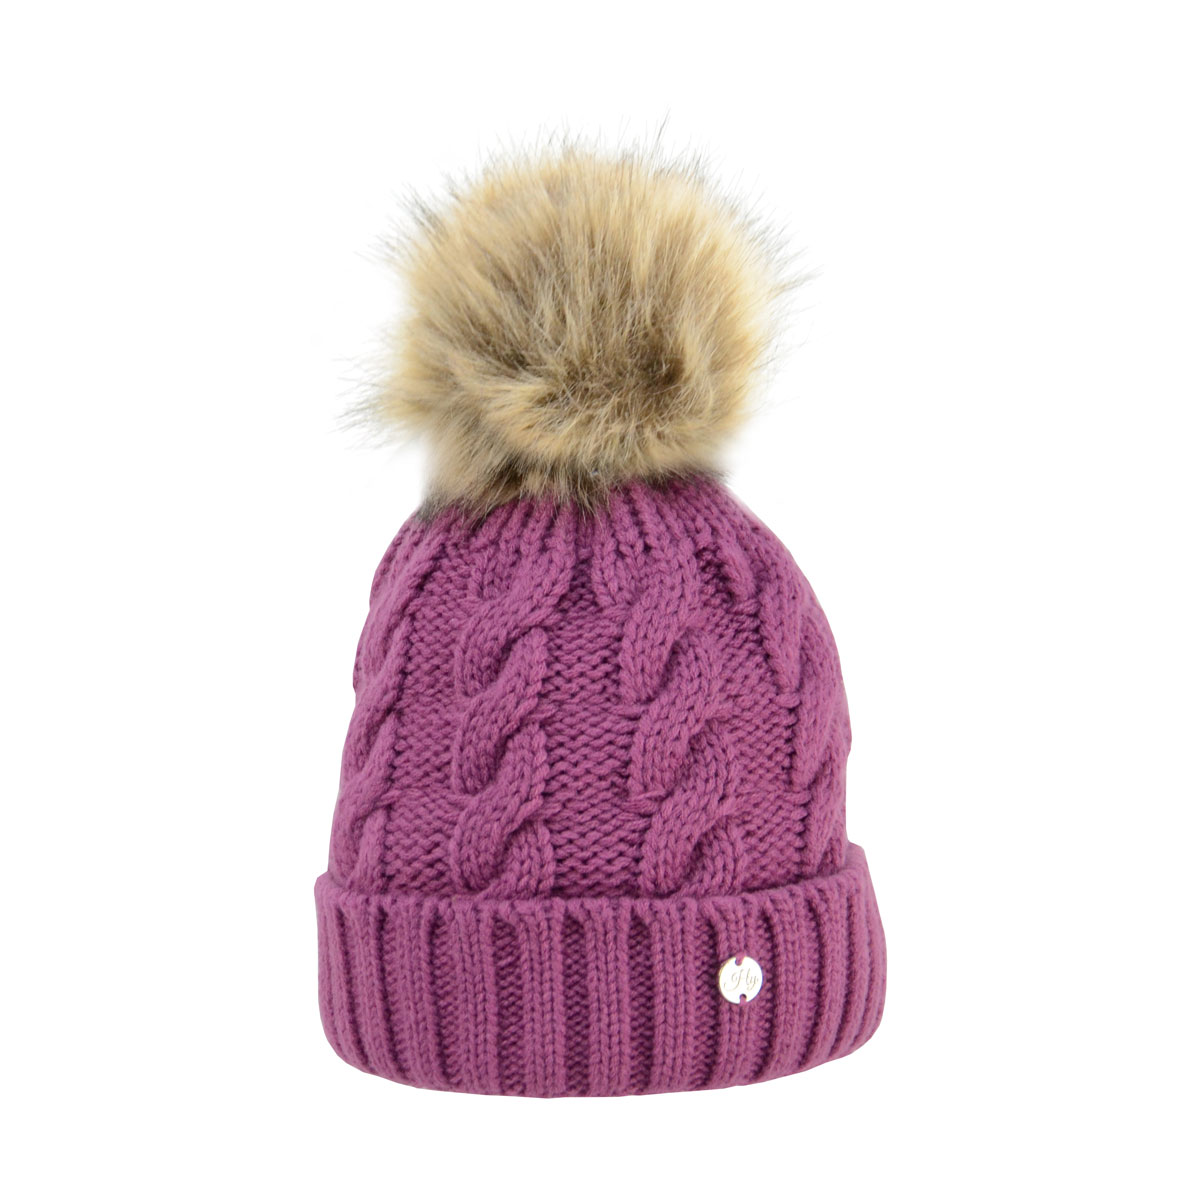 7dbf978f042 ... coupon hy fashion melrose cable knit bobble hat ladies 1d15c d10e5